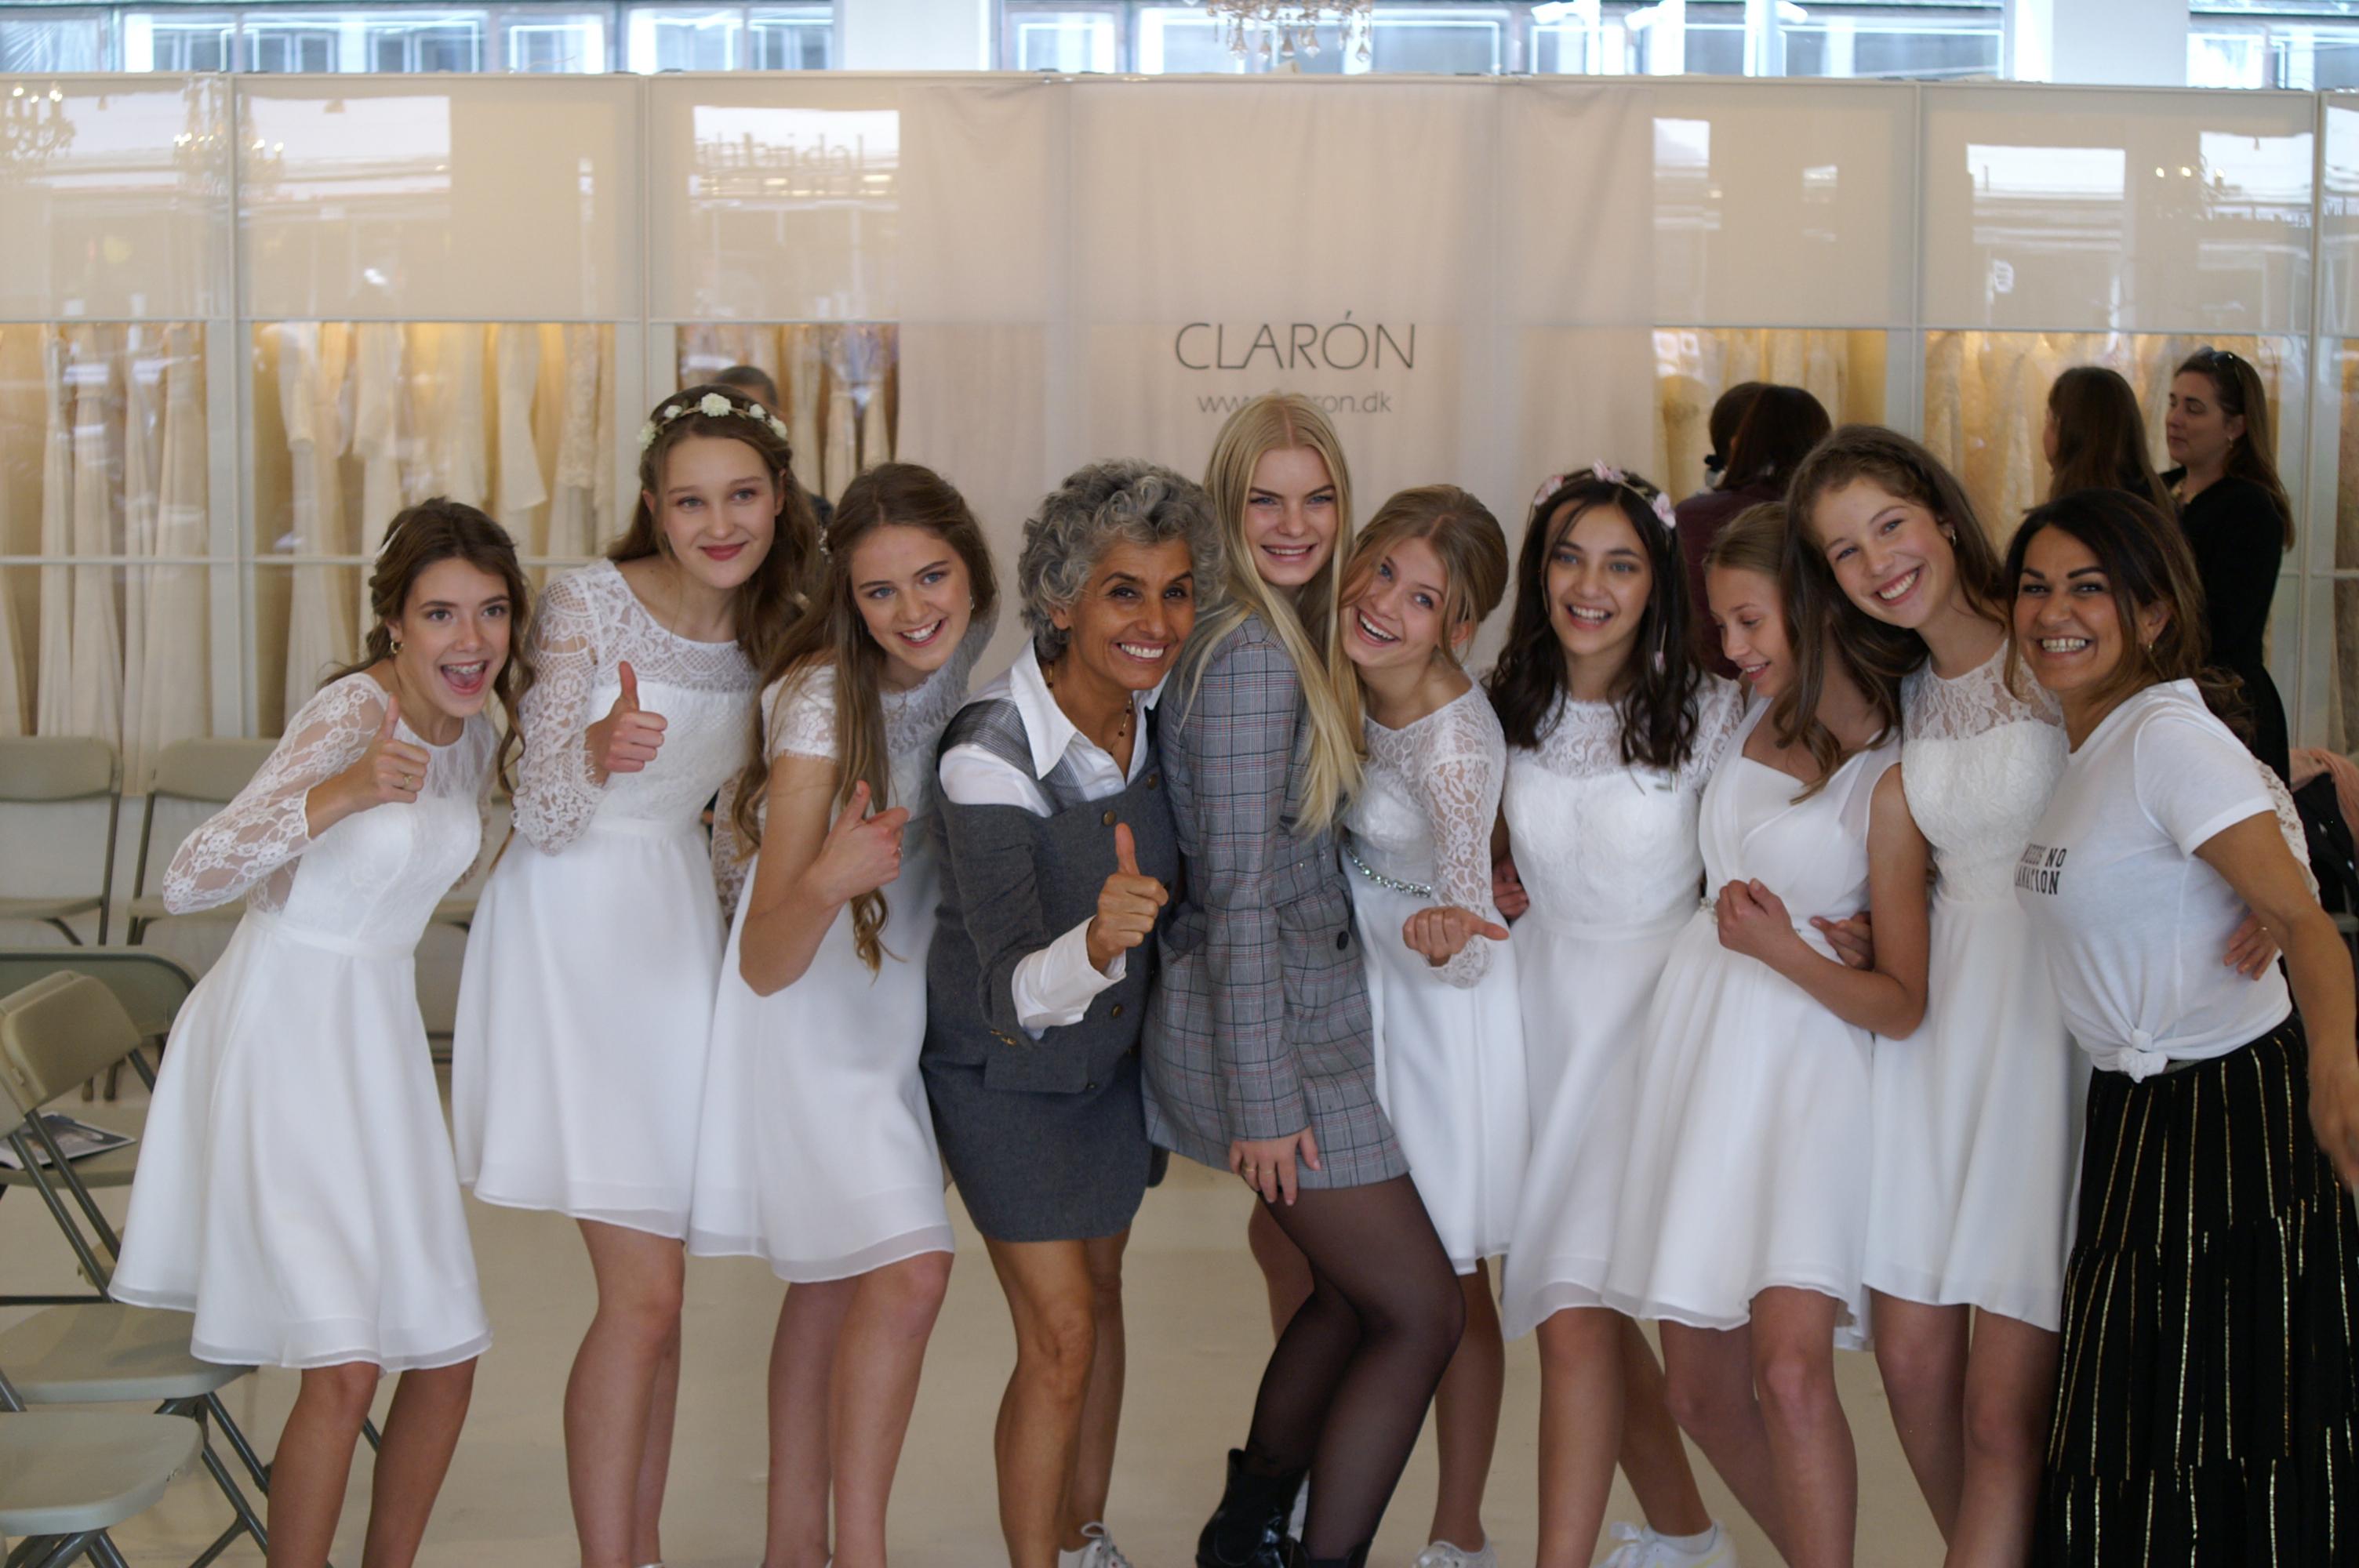 Modeshow 2020 - Tak for denne gang